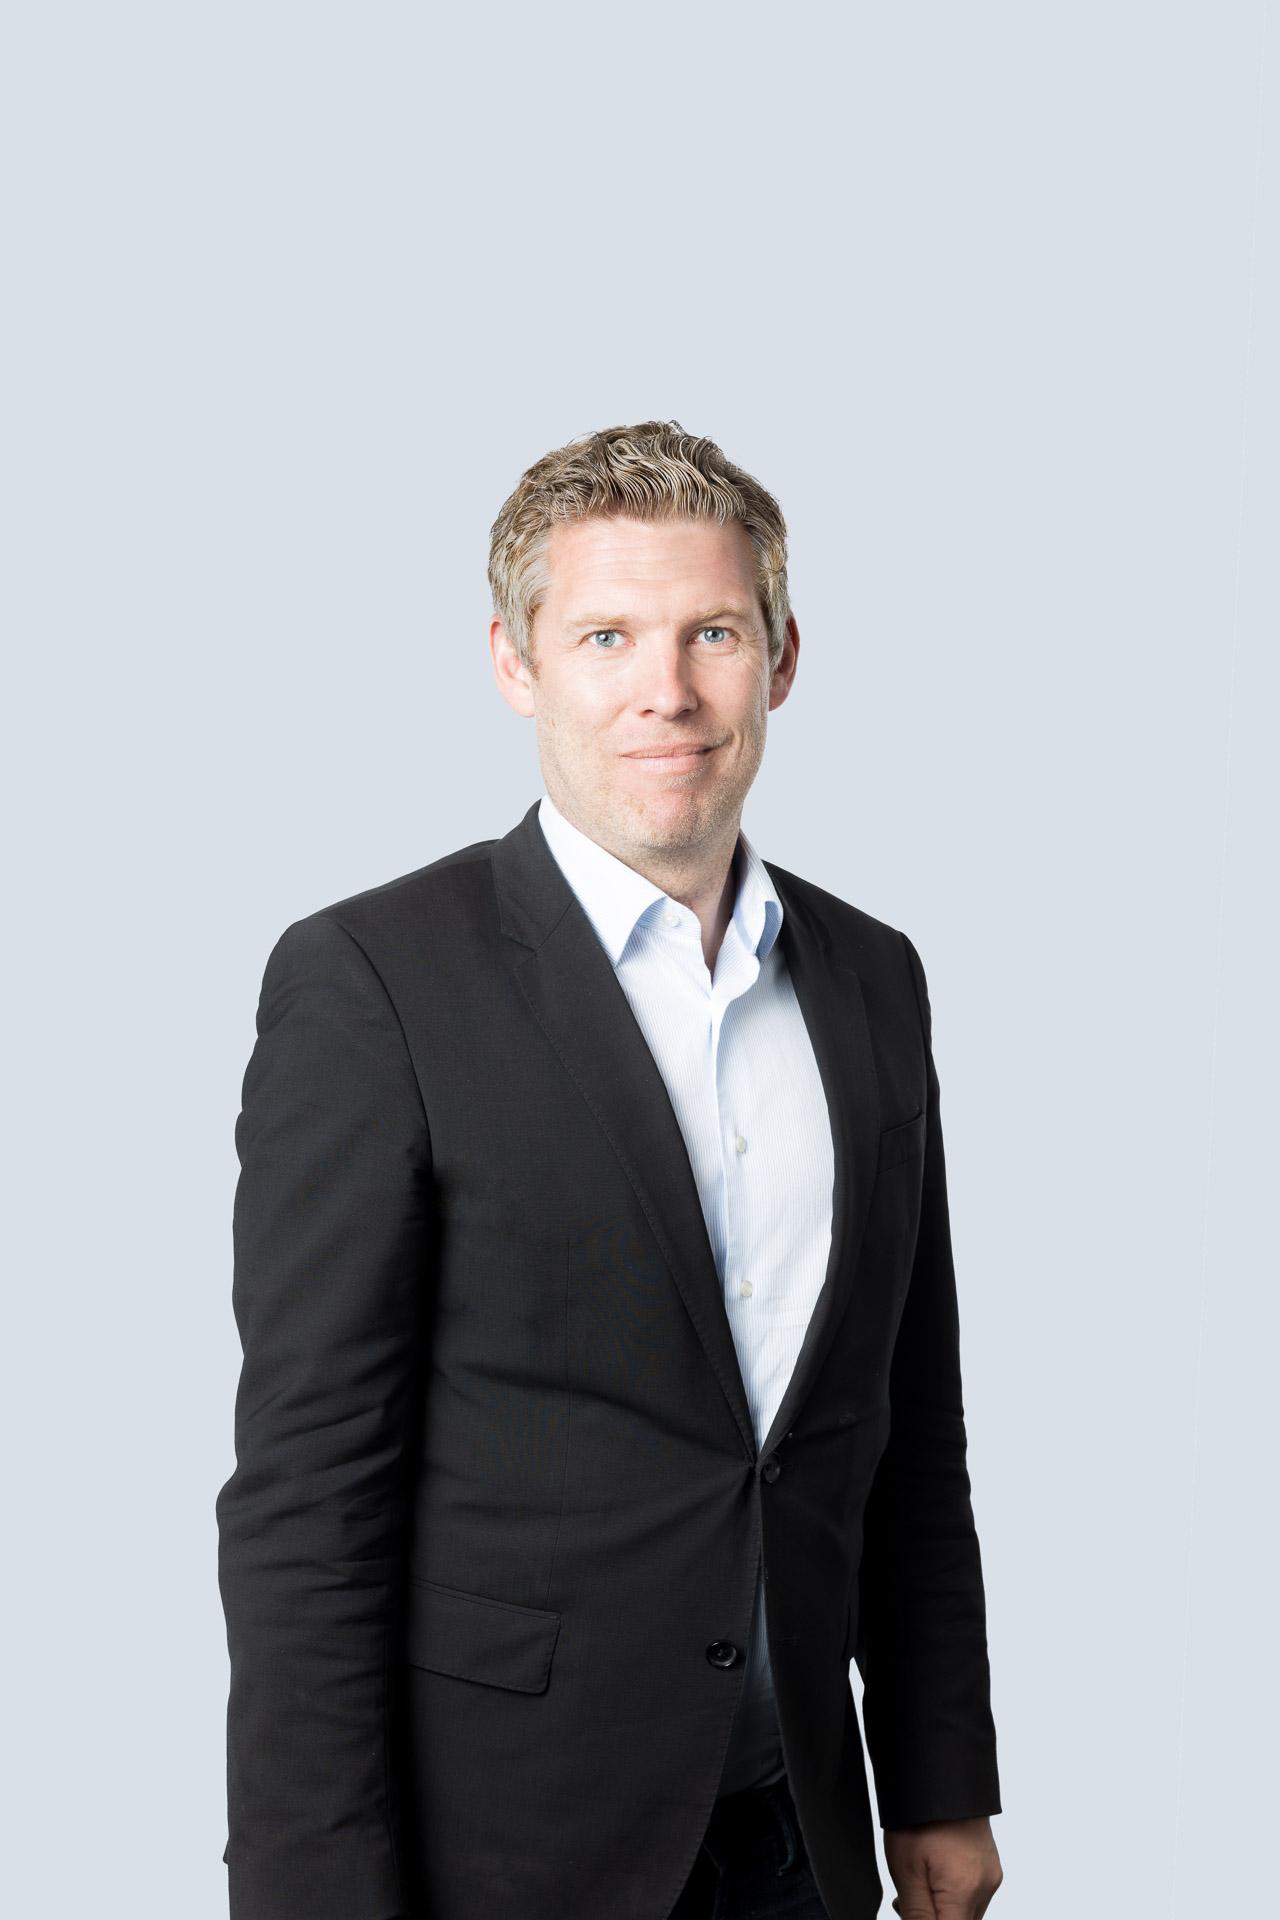 Lars Christian Hellevik